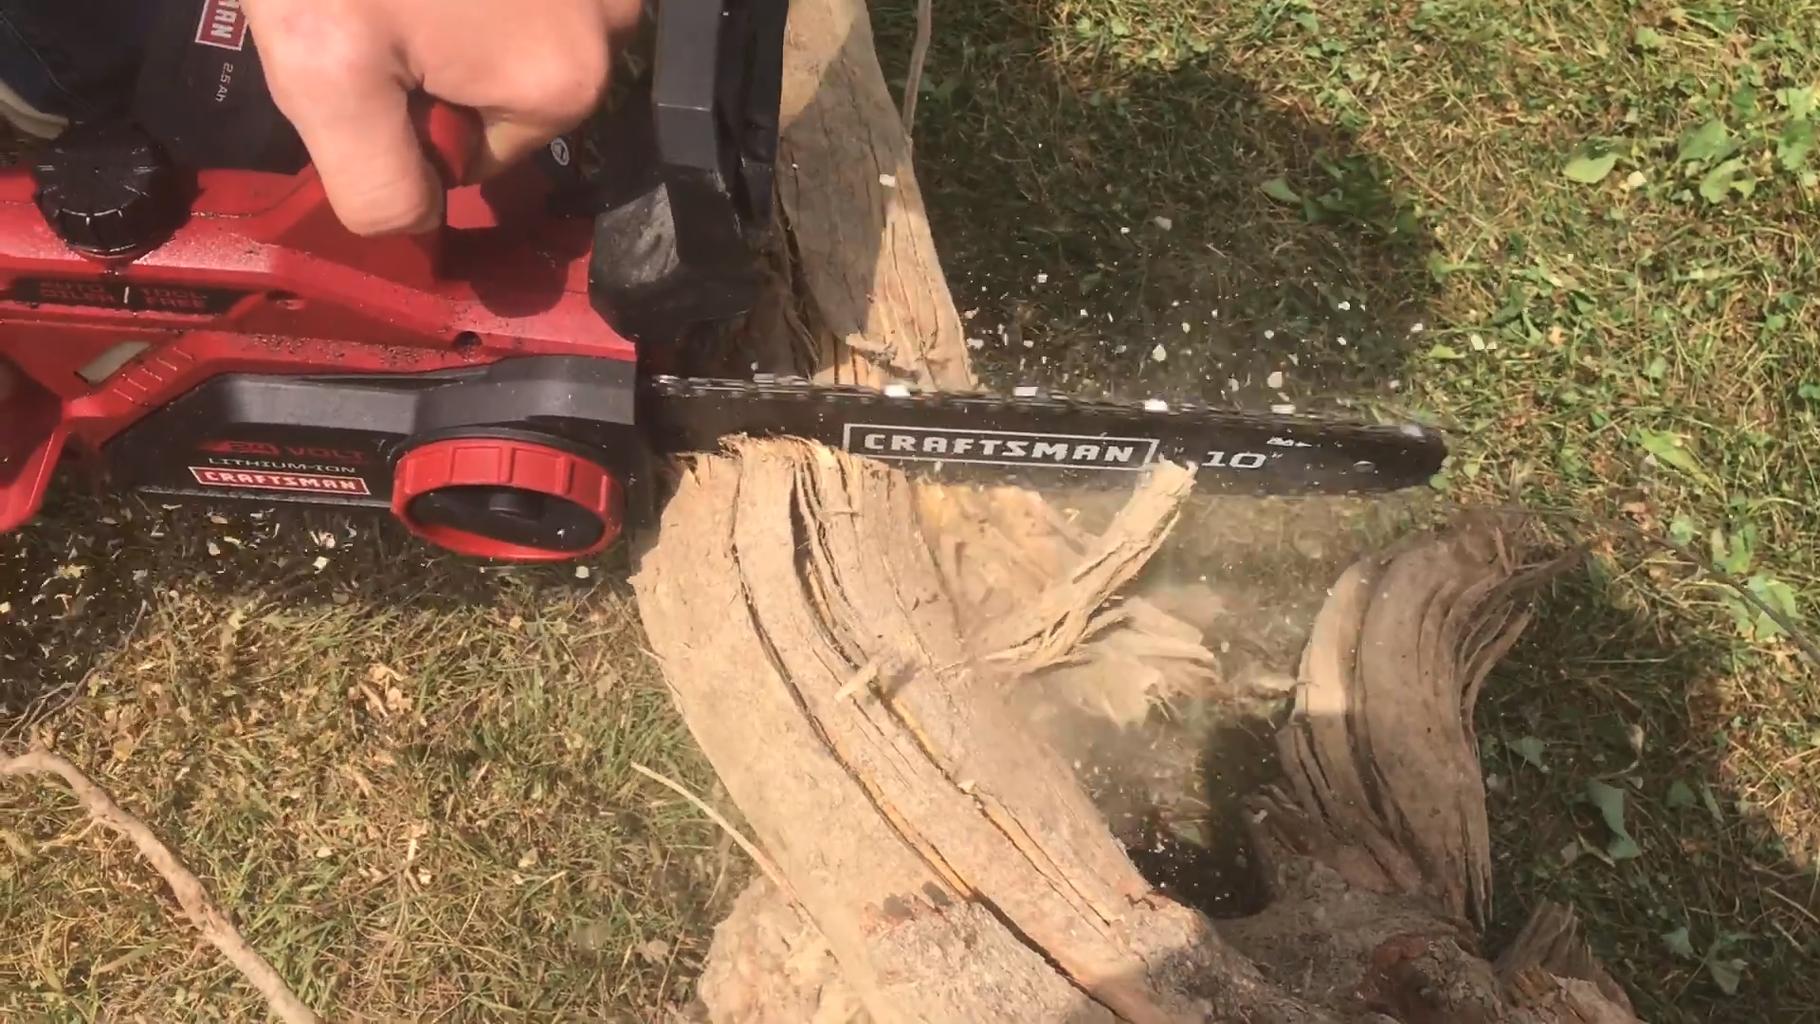 Chainsaw, Chainsaw, Chainsaw